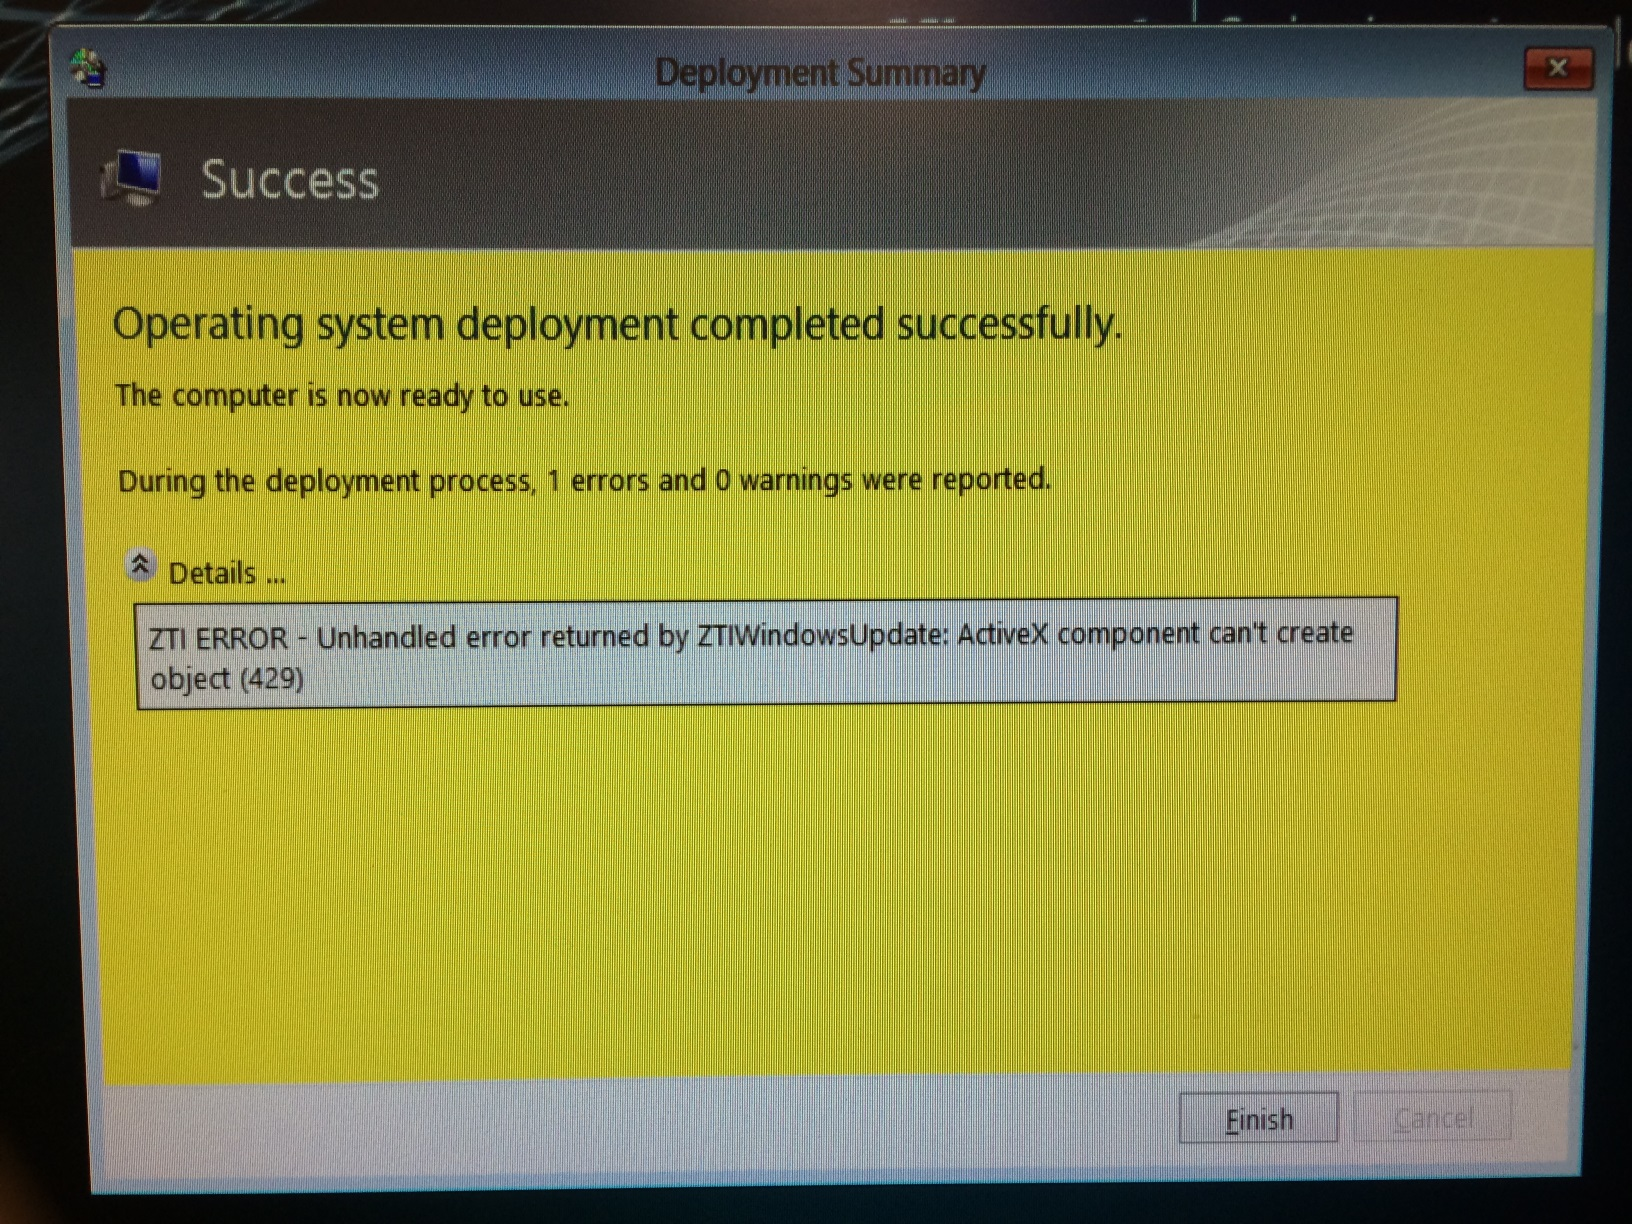 ZTI ERROR - Unhandled error returned by ZTIWindowsUpdate: ActiveX component can't create object (429)